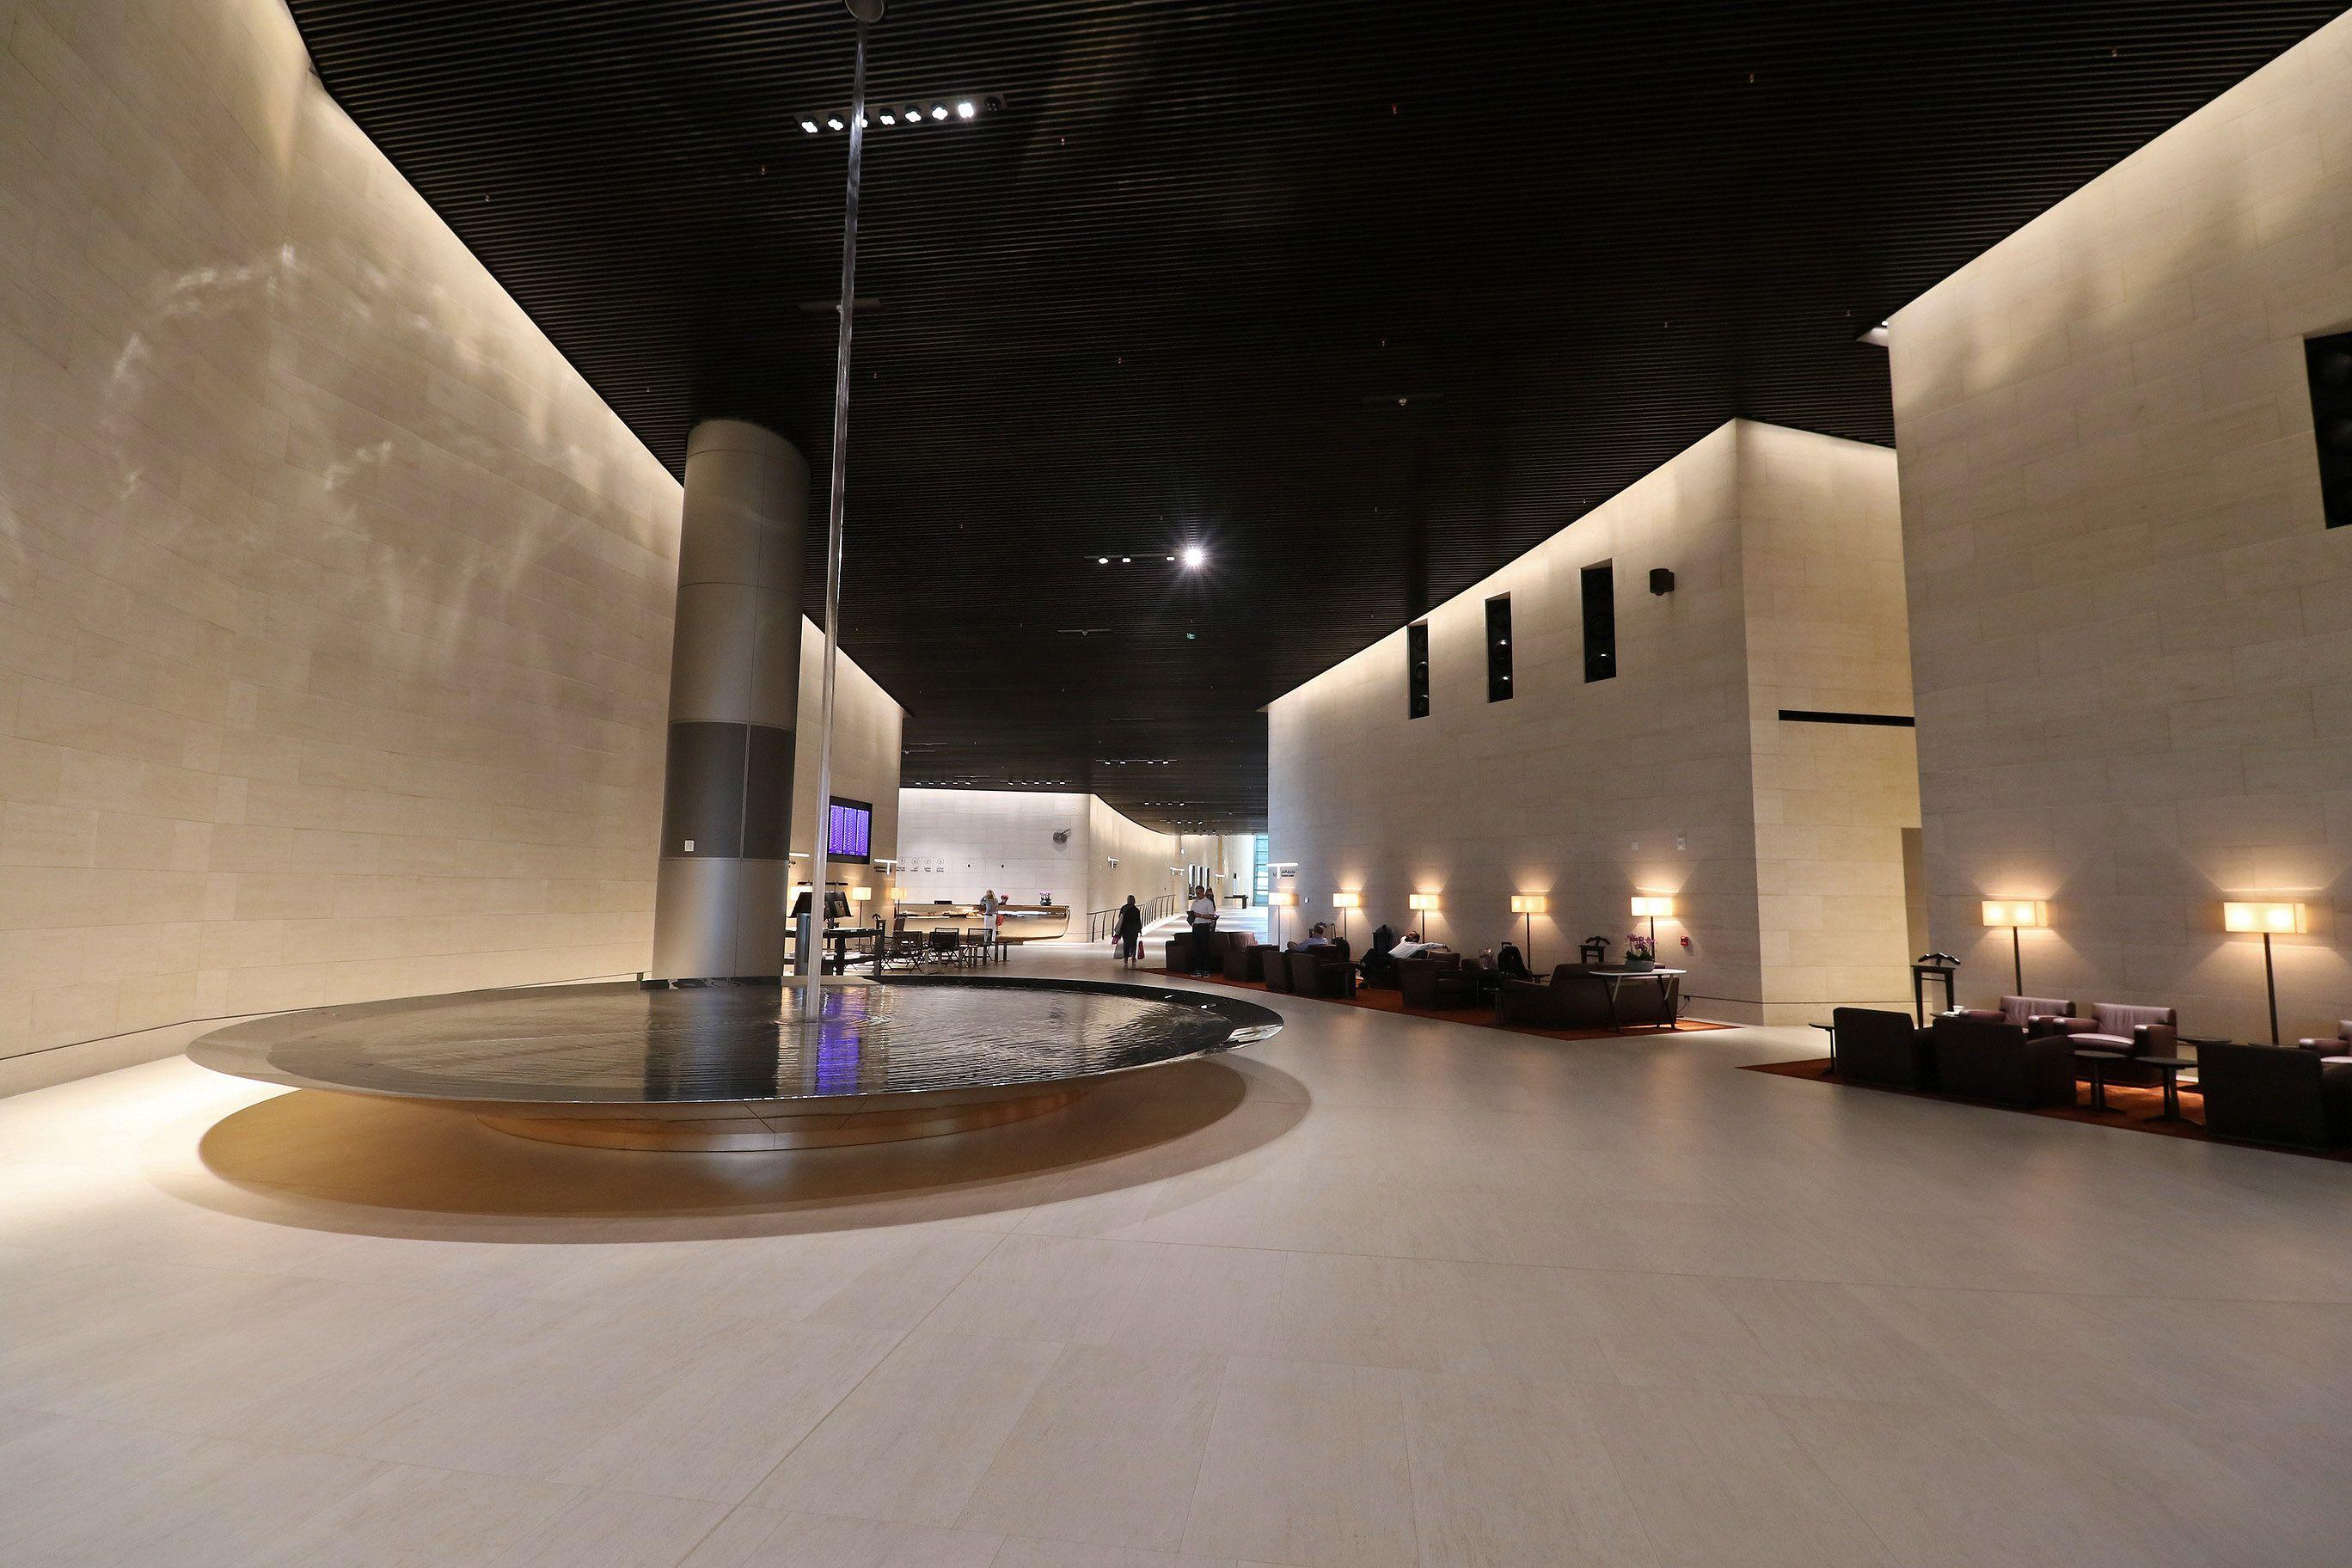 Enjoying The Beautiful Qatar Airways Al Safwa First Class Lounge In Doha